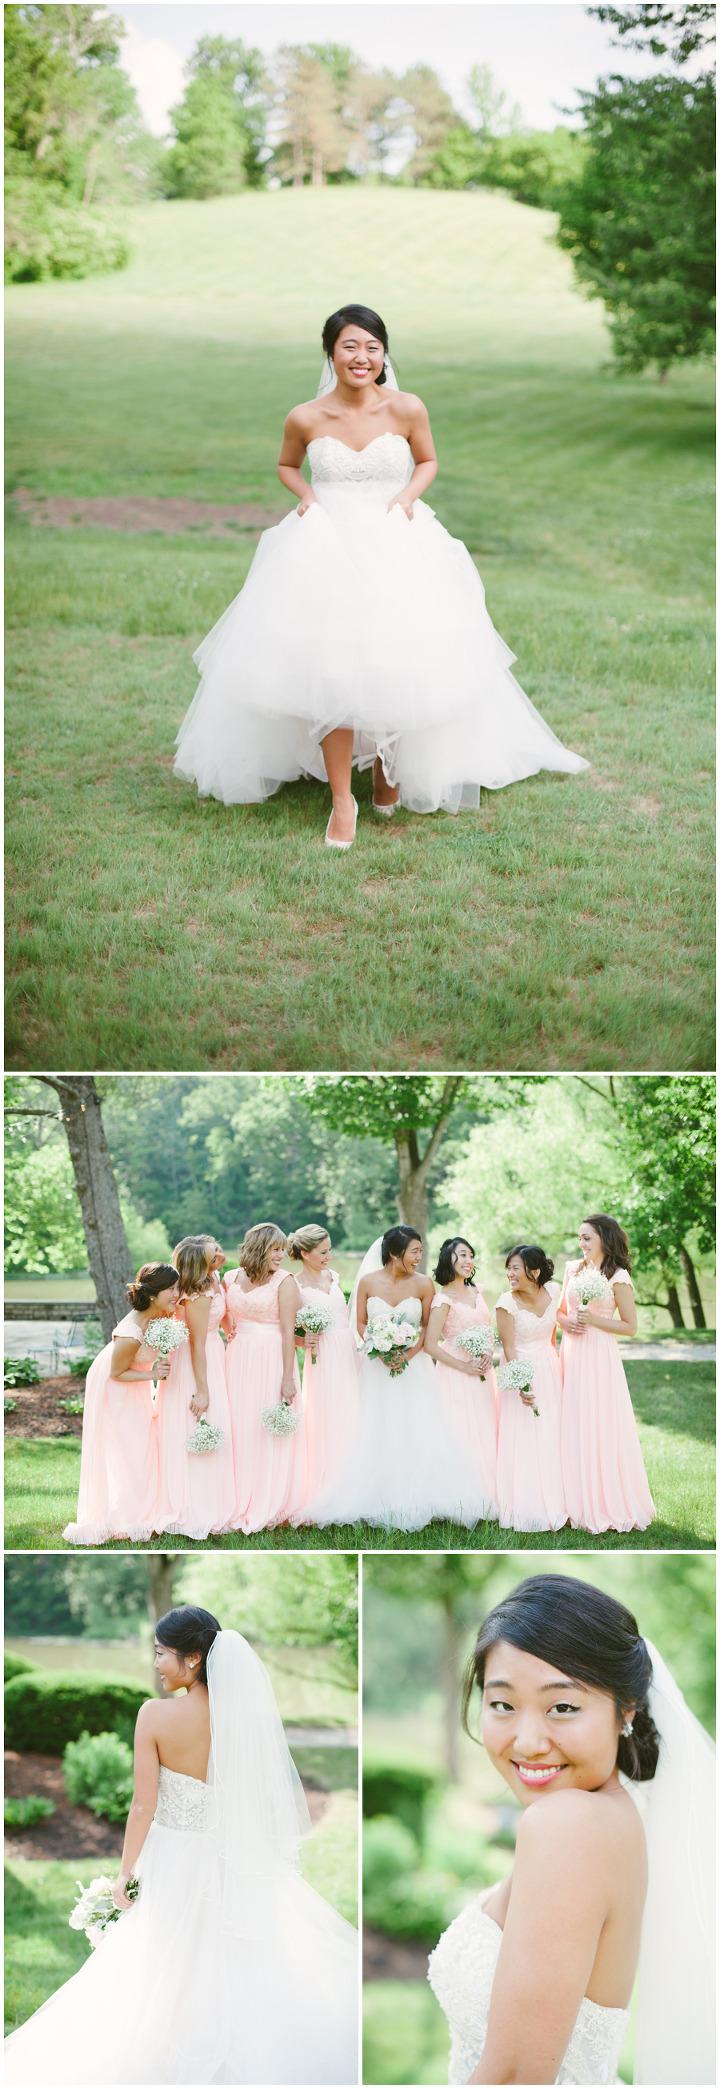 Blog Collage-Ruthie10